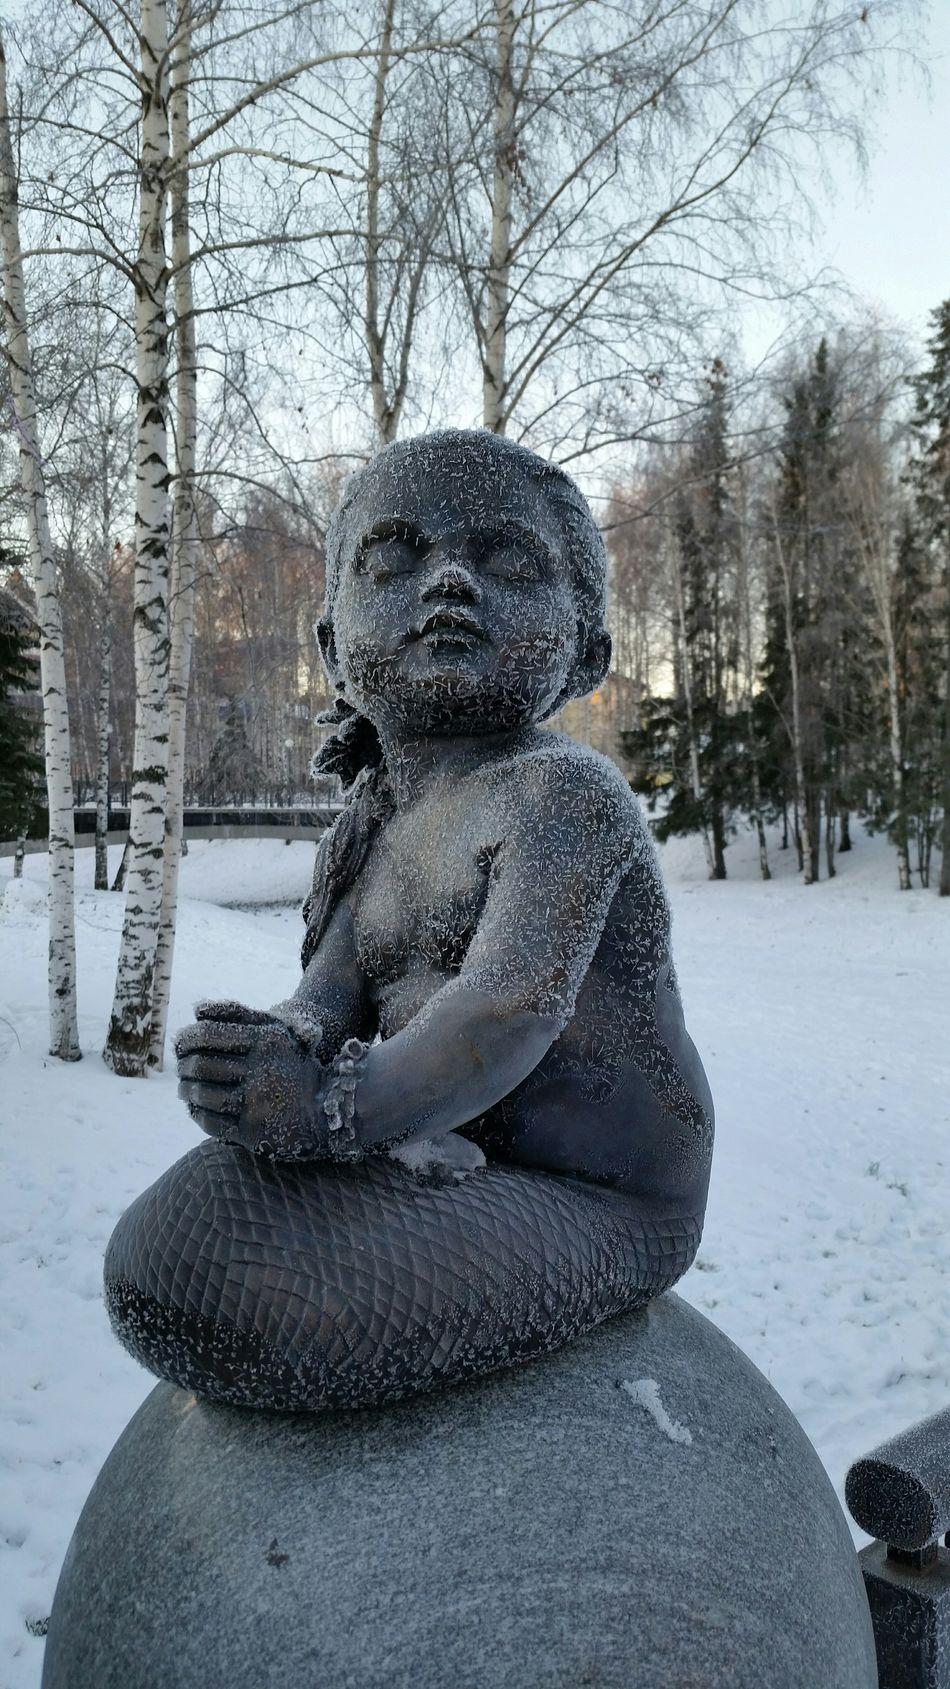 Русалка замерзла скульптура Mermaid Frozen Sculpture Morning